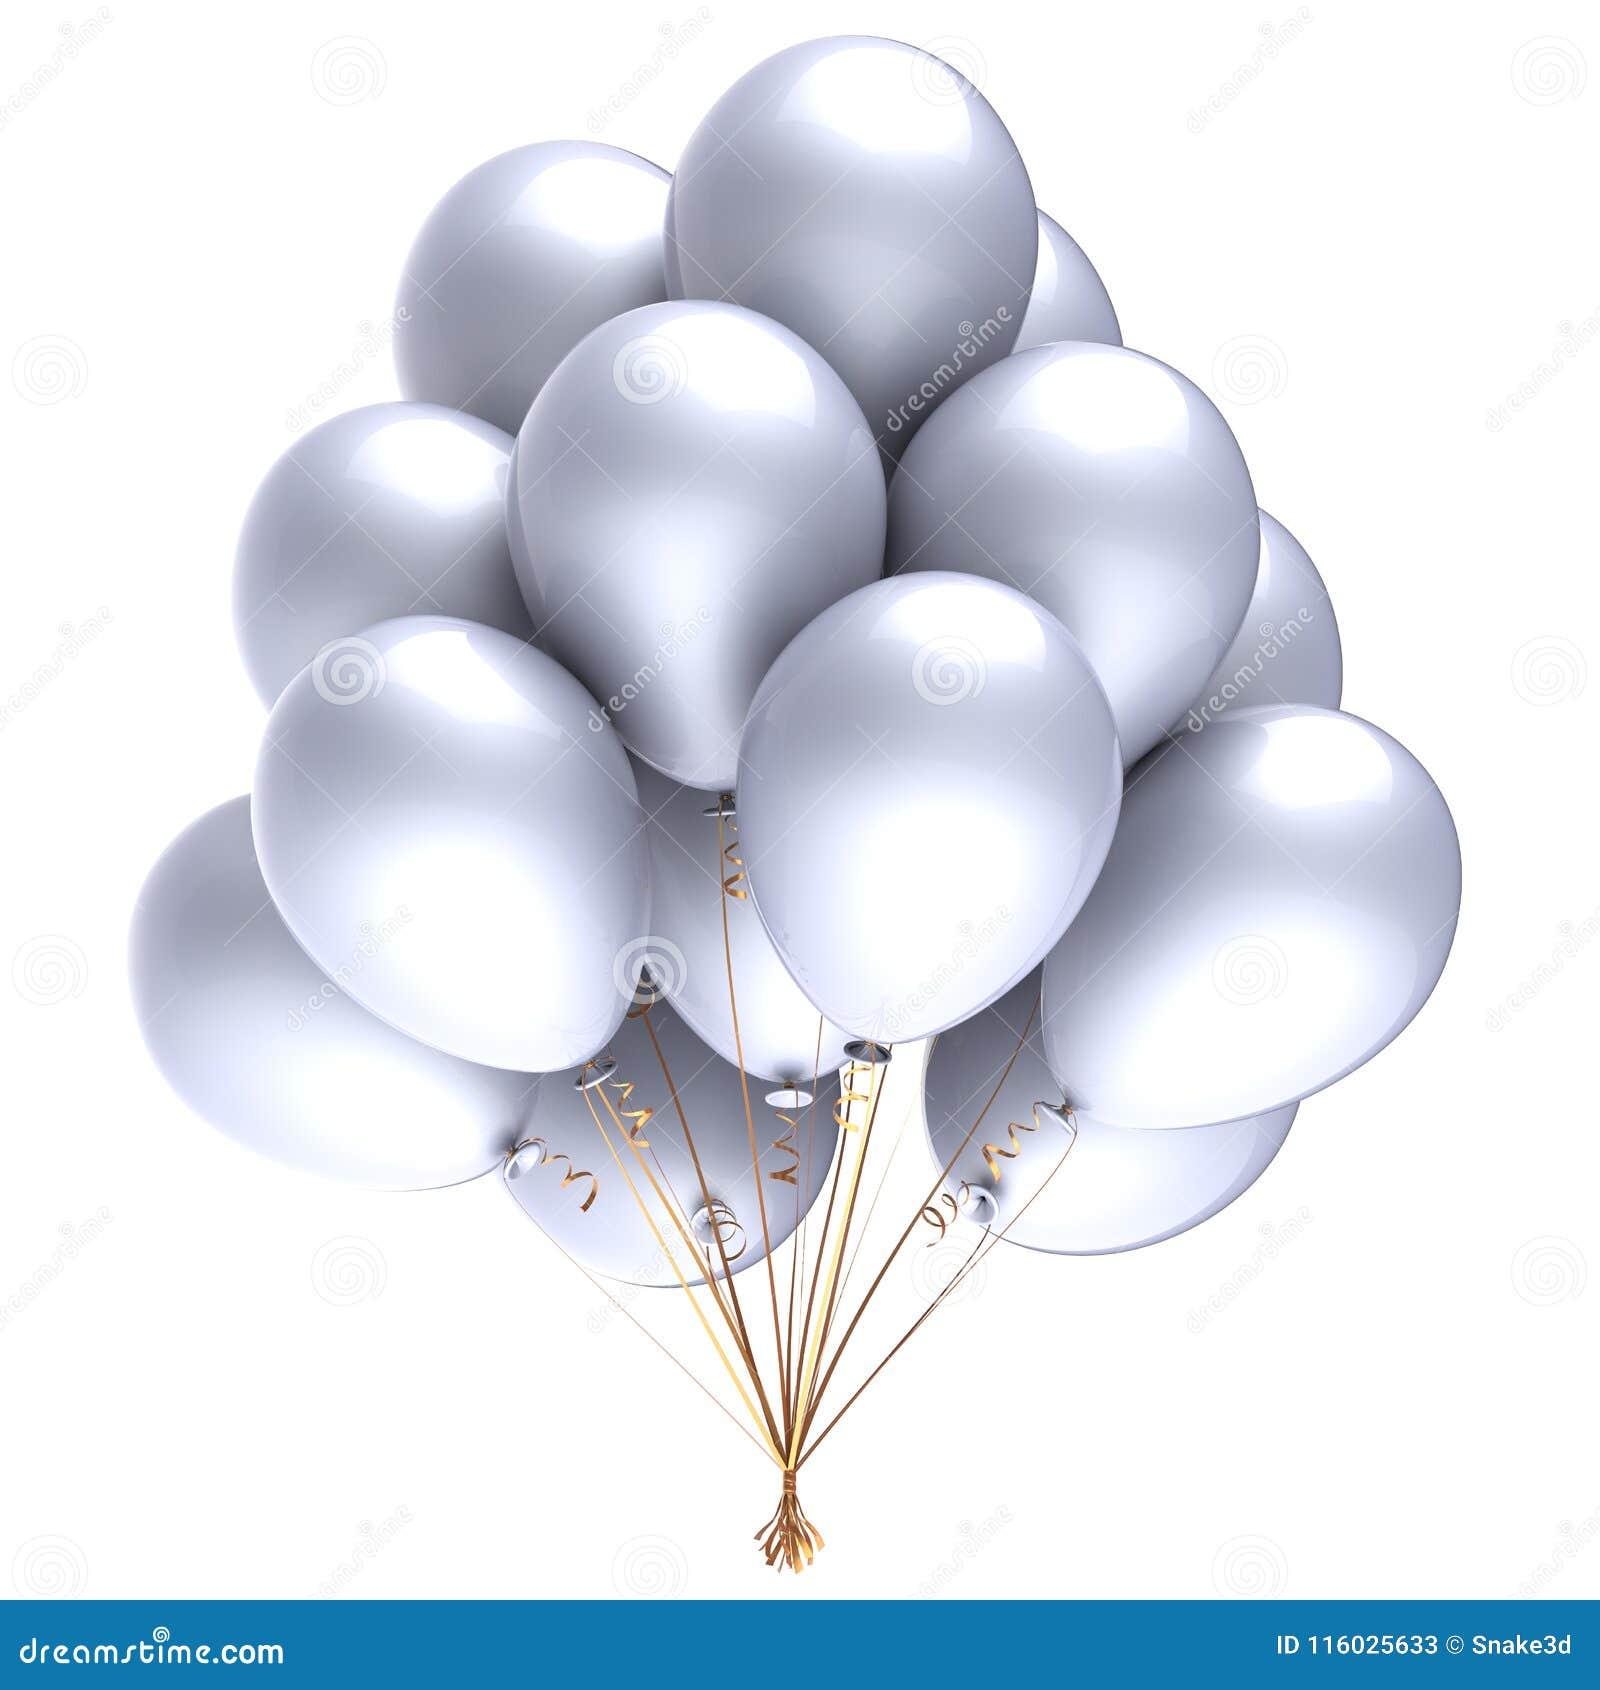 Balloons bunch white glossy